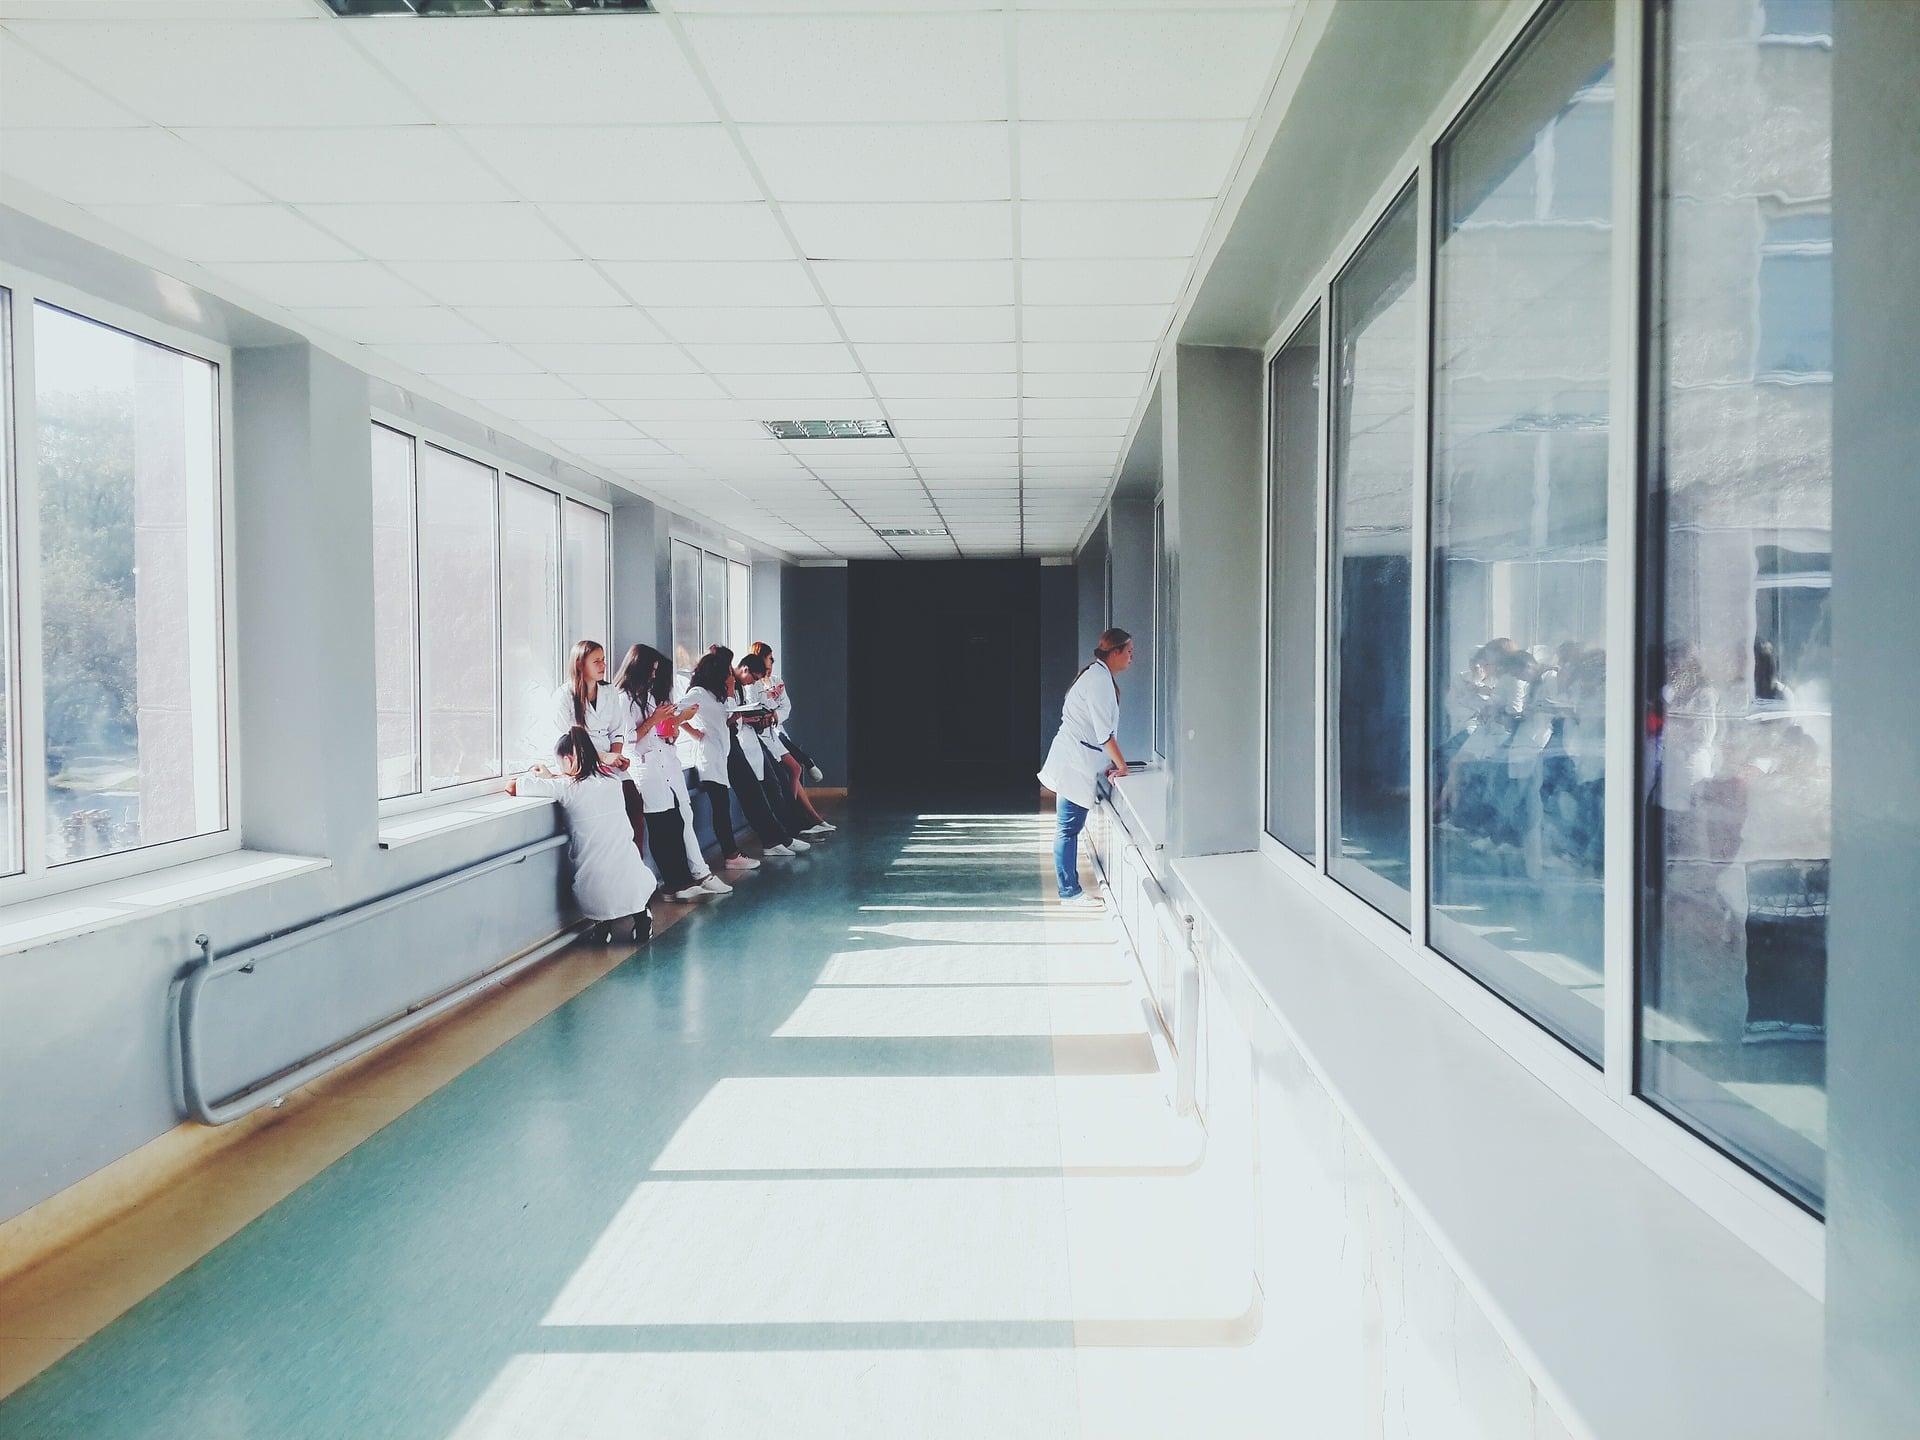 NHS Workforce Shortage – More from Readers